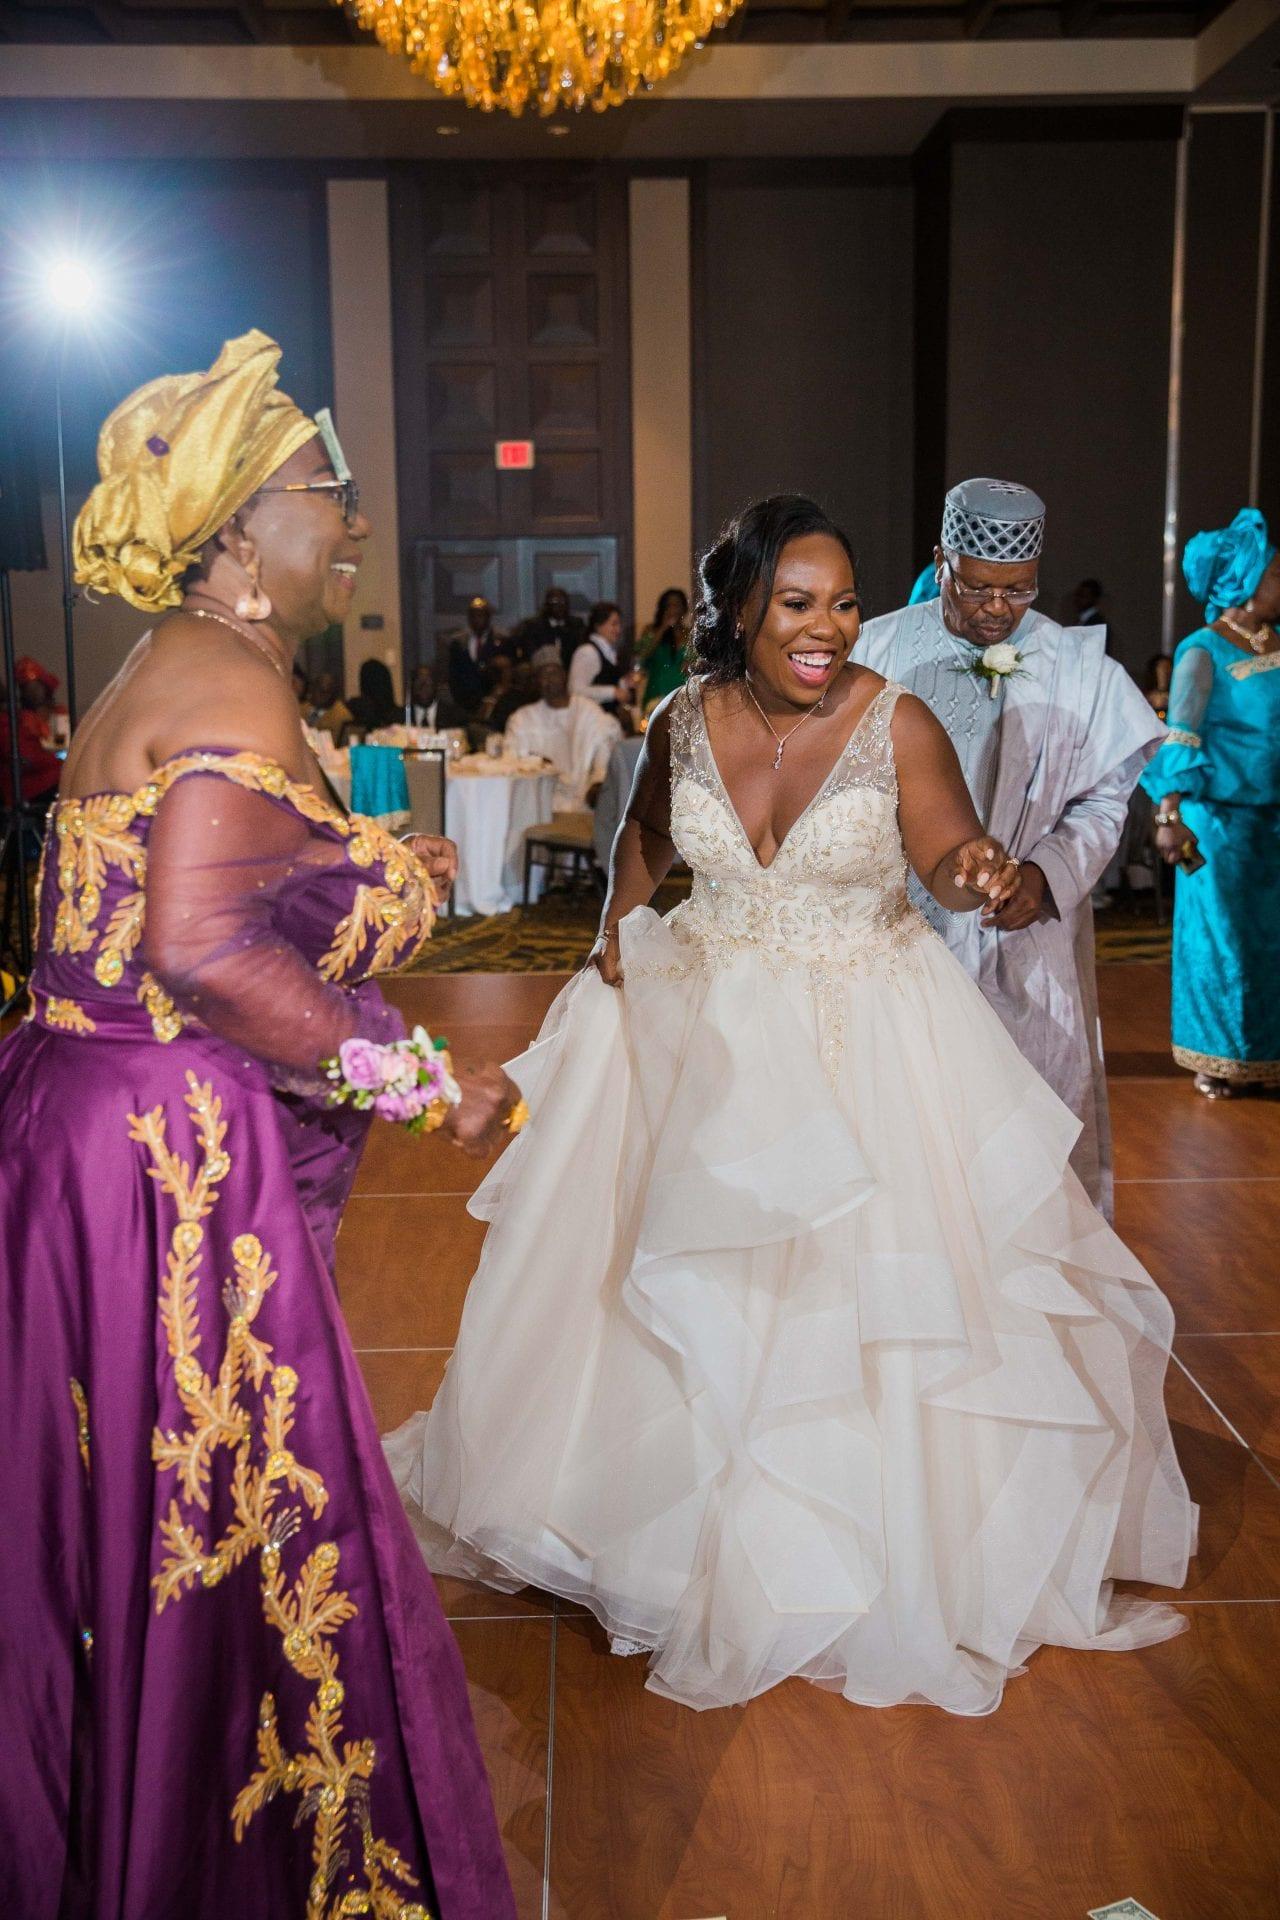 Onyema wedding La Cantera dancing mom and bride